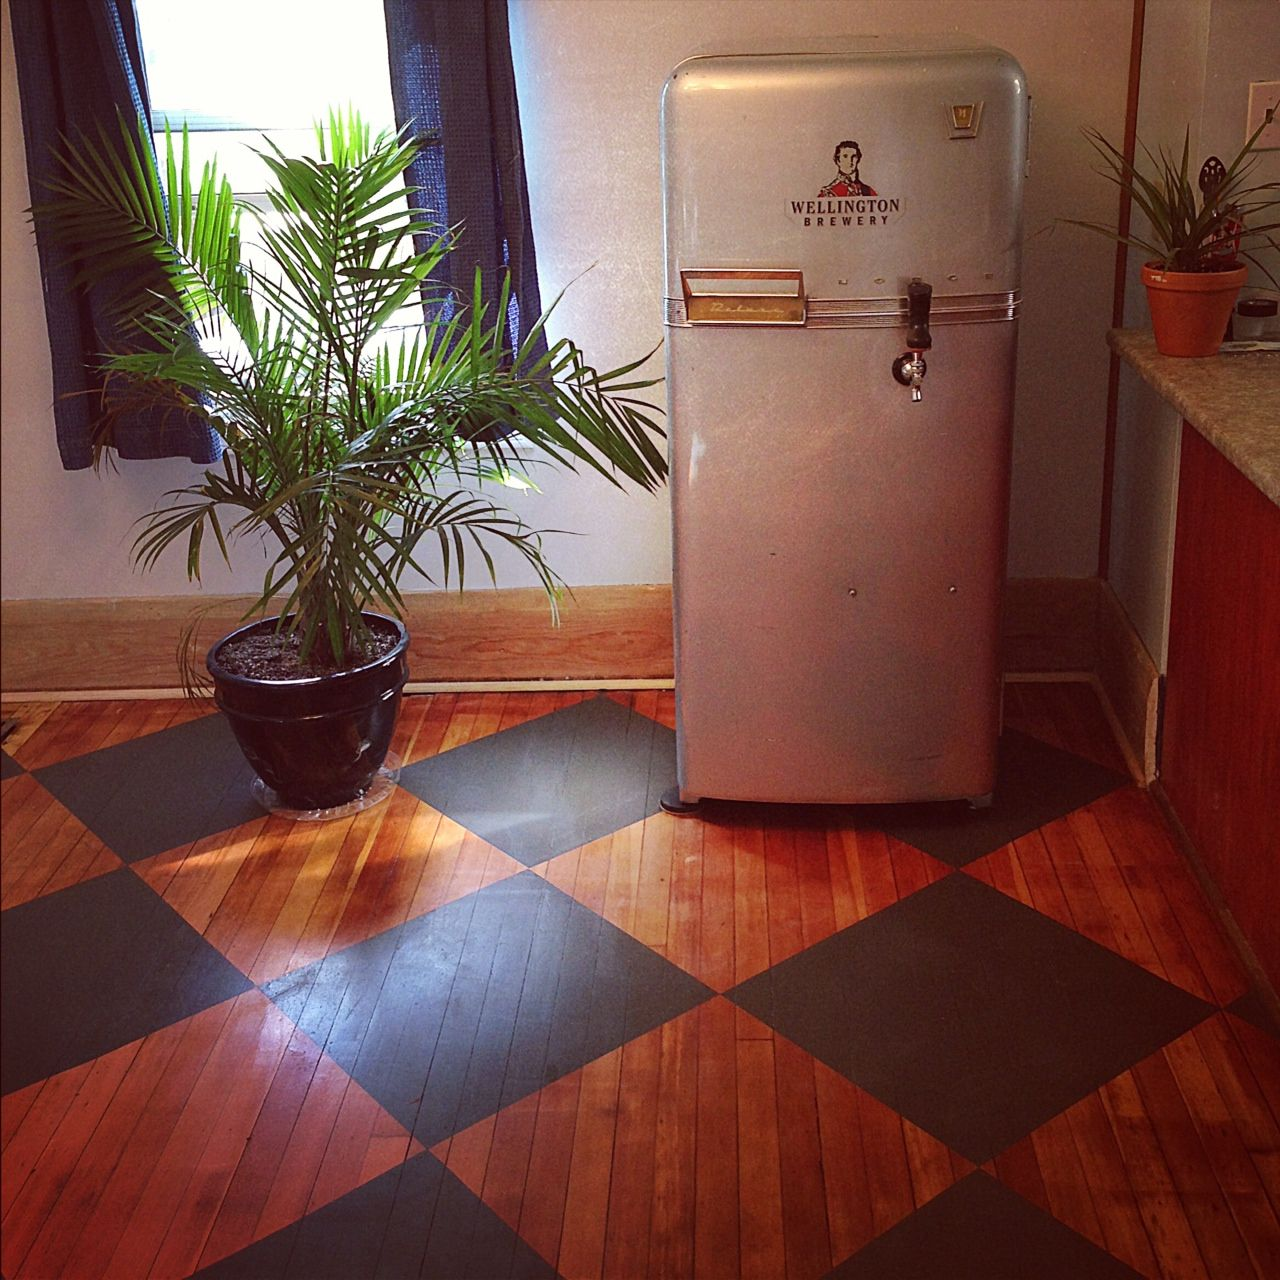 Checkered Kitchen Floor: Painted Checkered Wood Kitchen Floor, Retro Keg Fridge